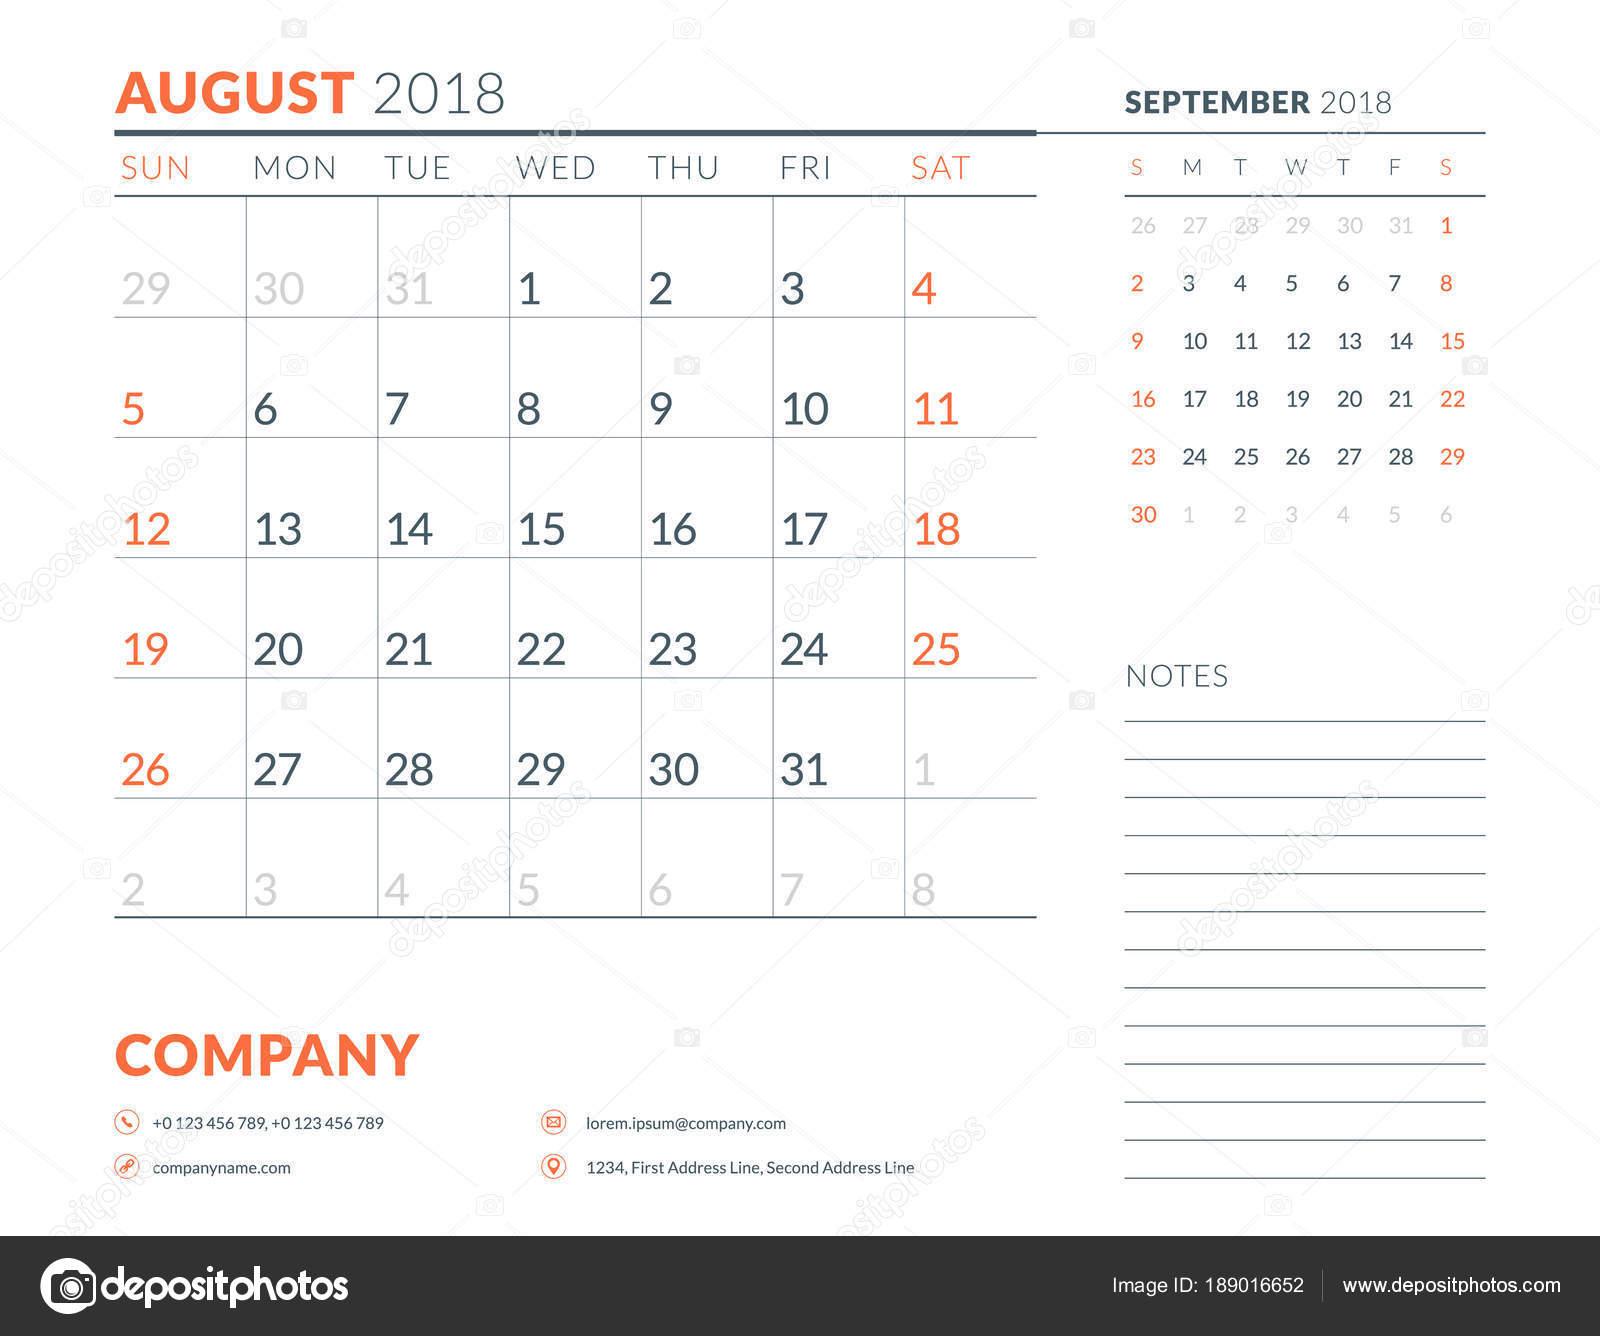 august 2018 calendar planner design template week starts on sunday